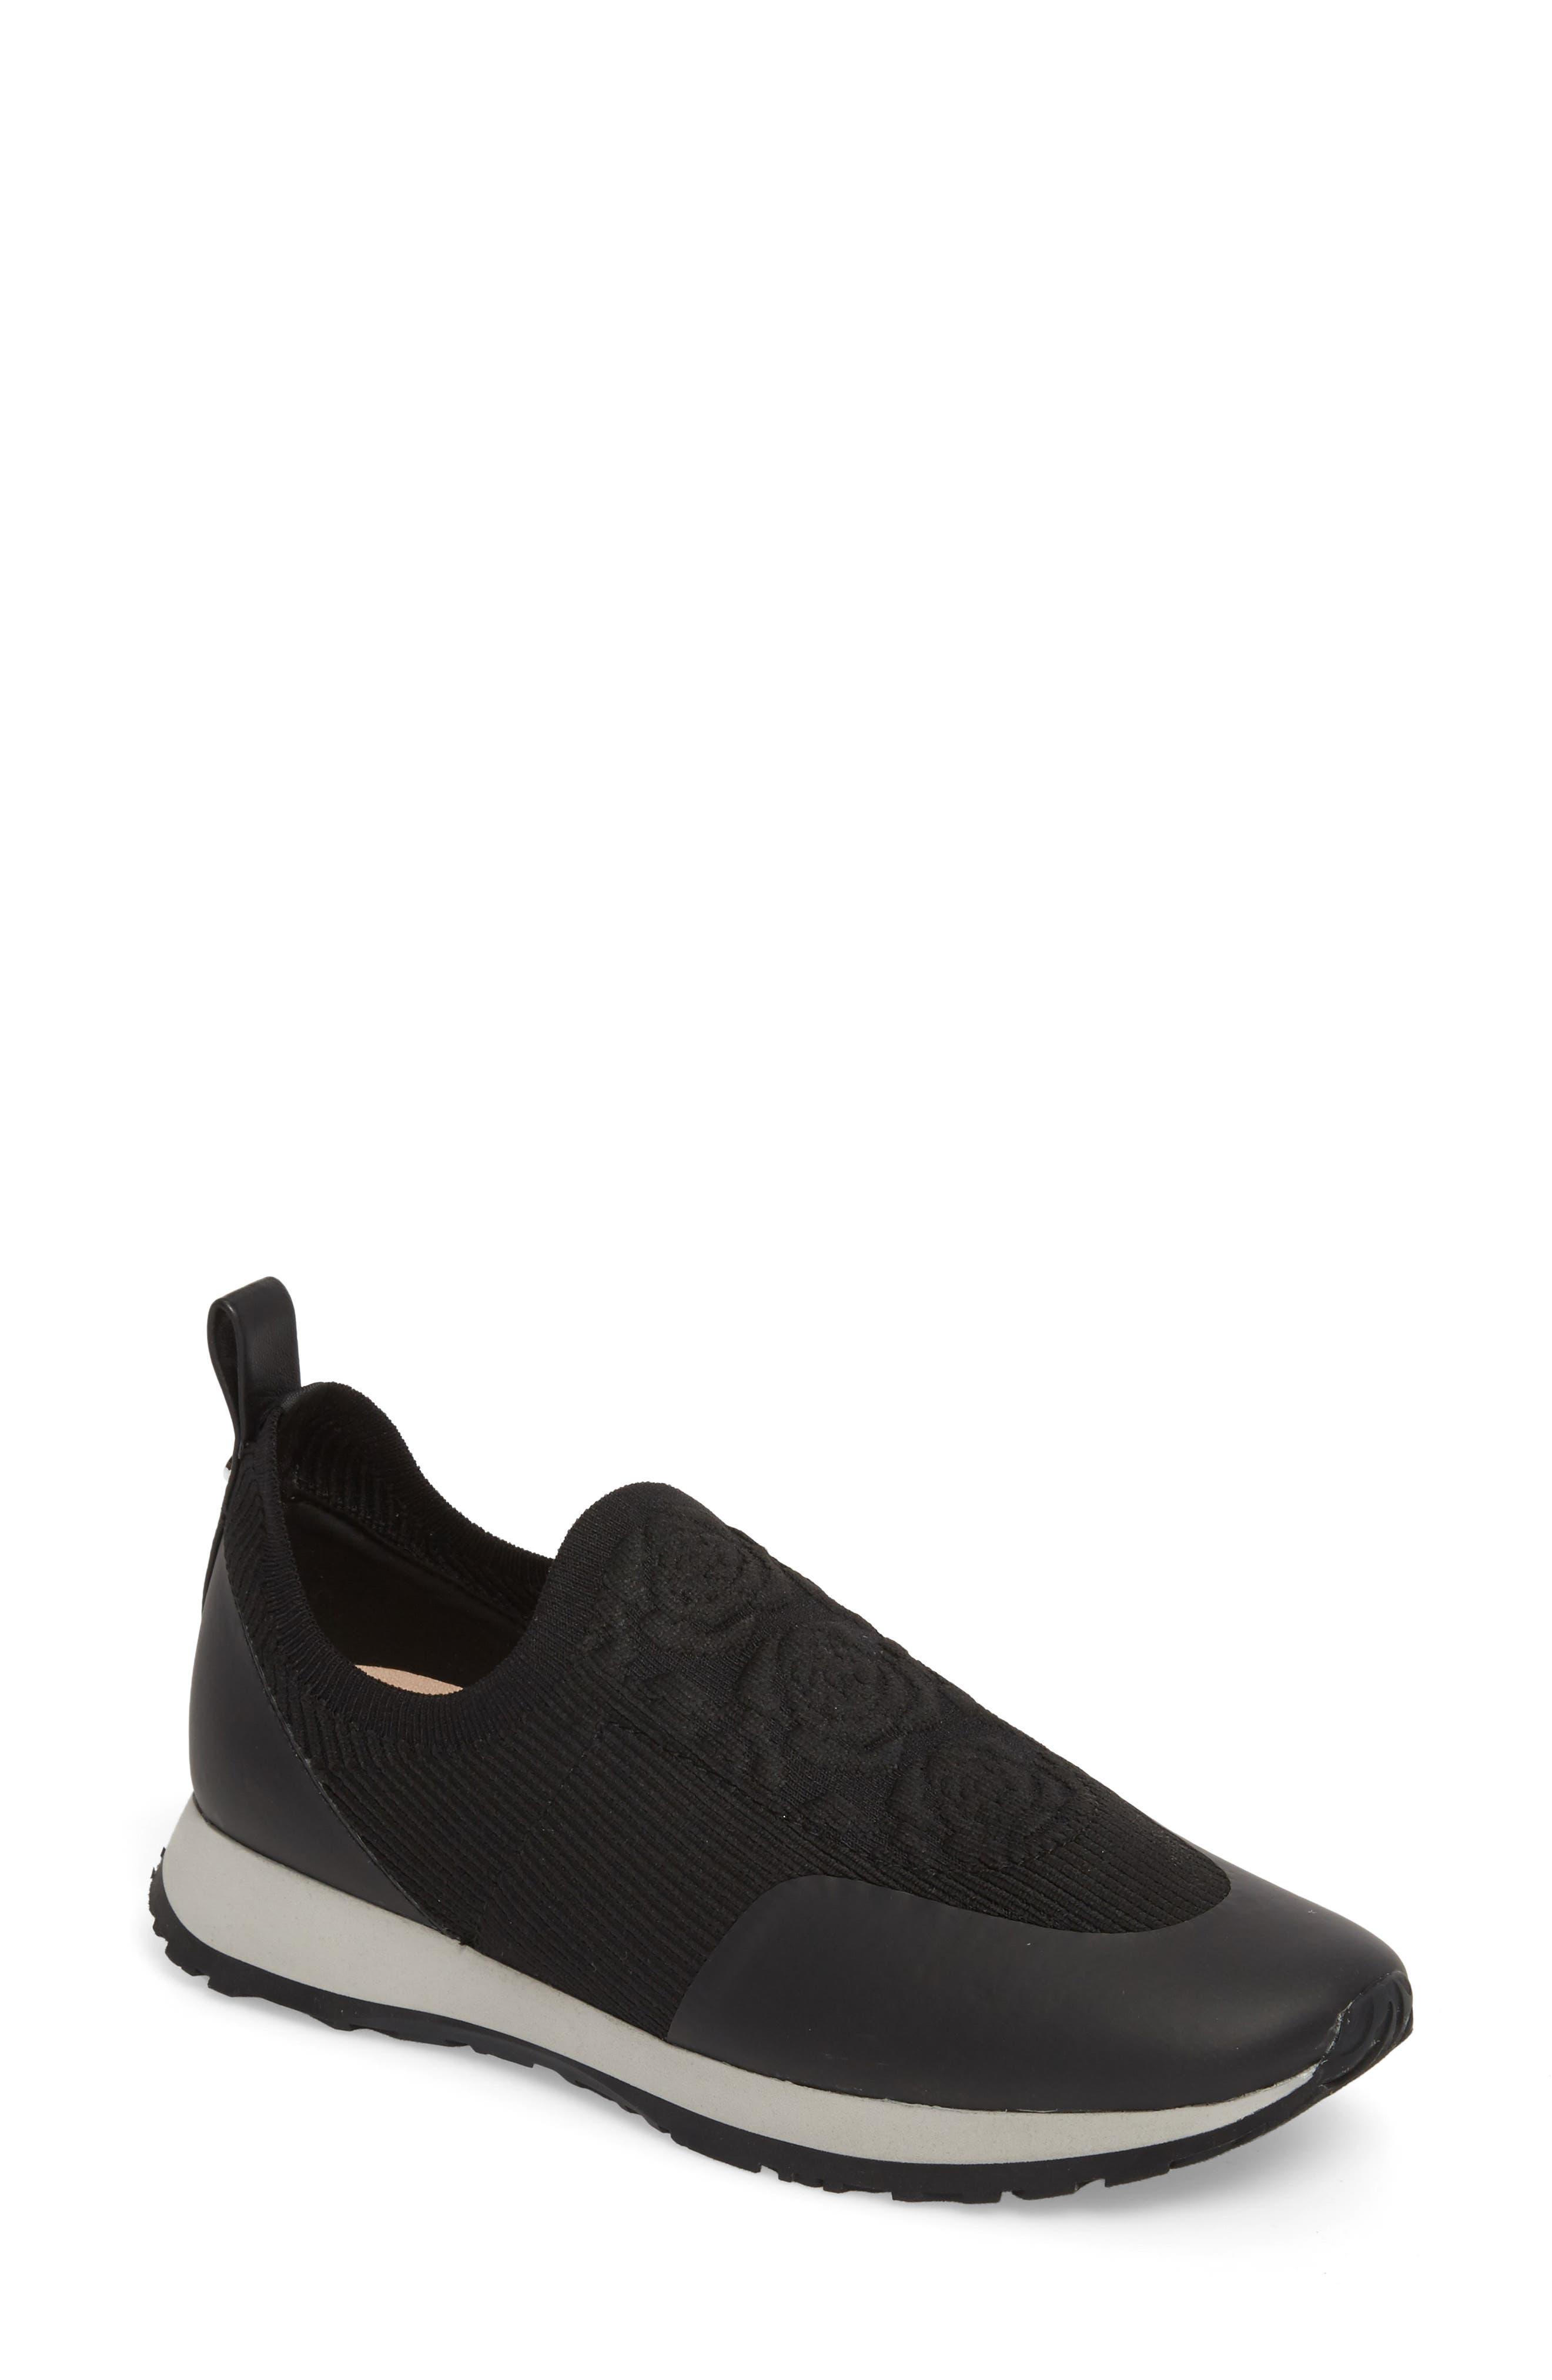 Cara Slip-On Sneaker,                             Main thumbnail 1, color,                             001